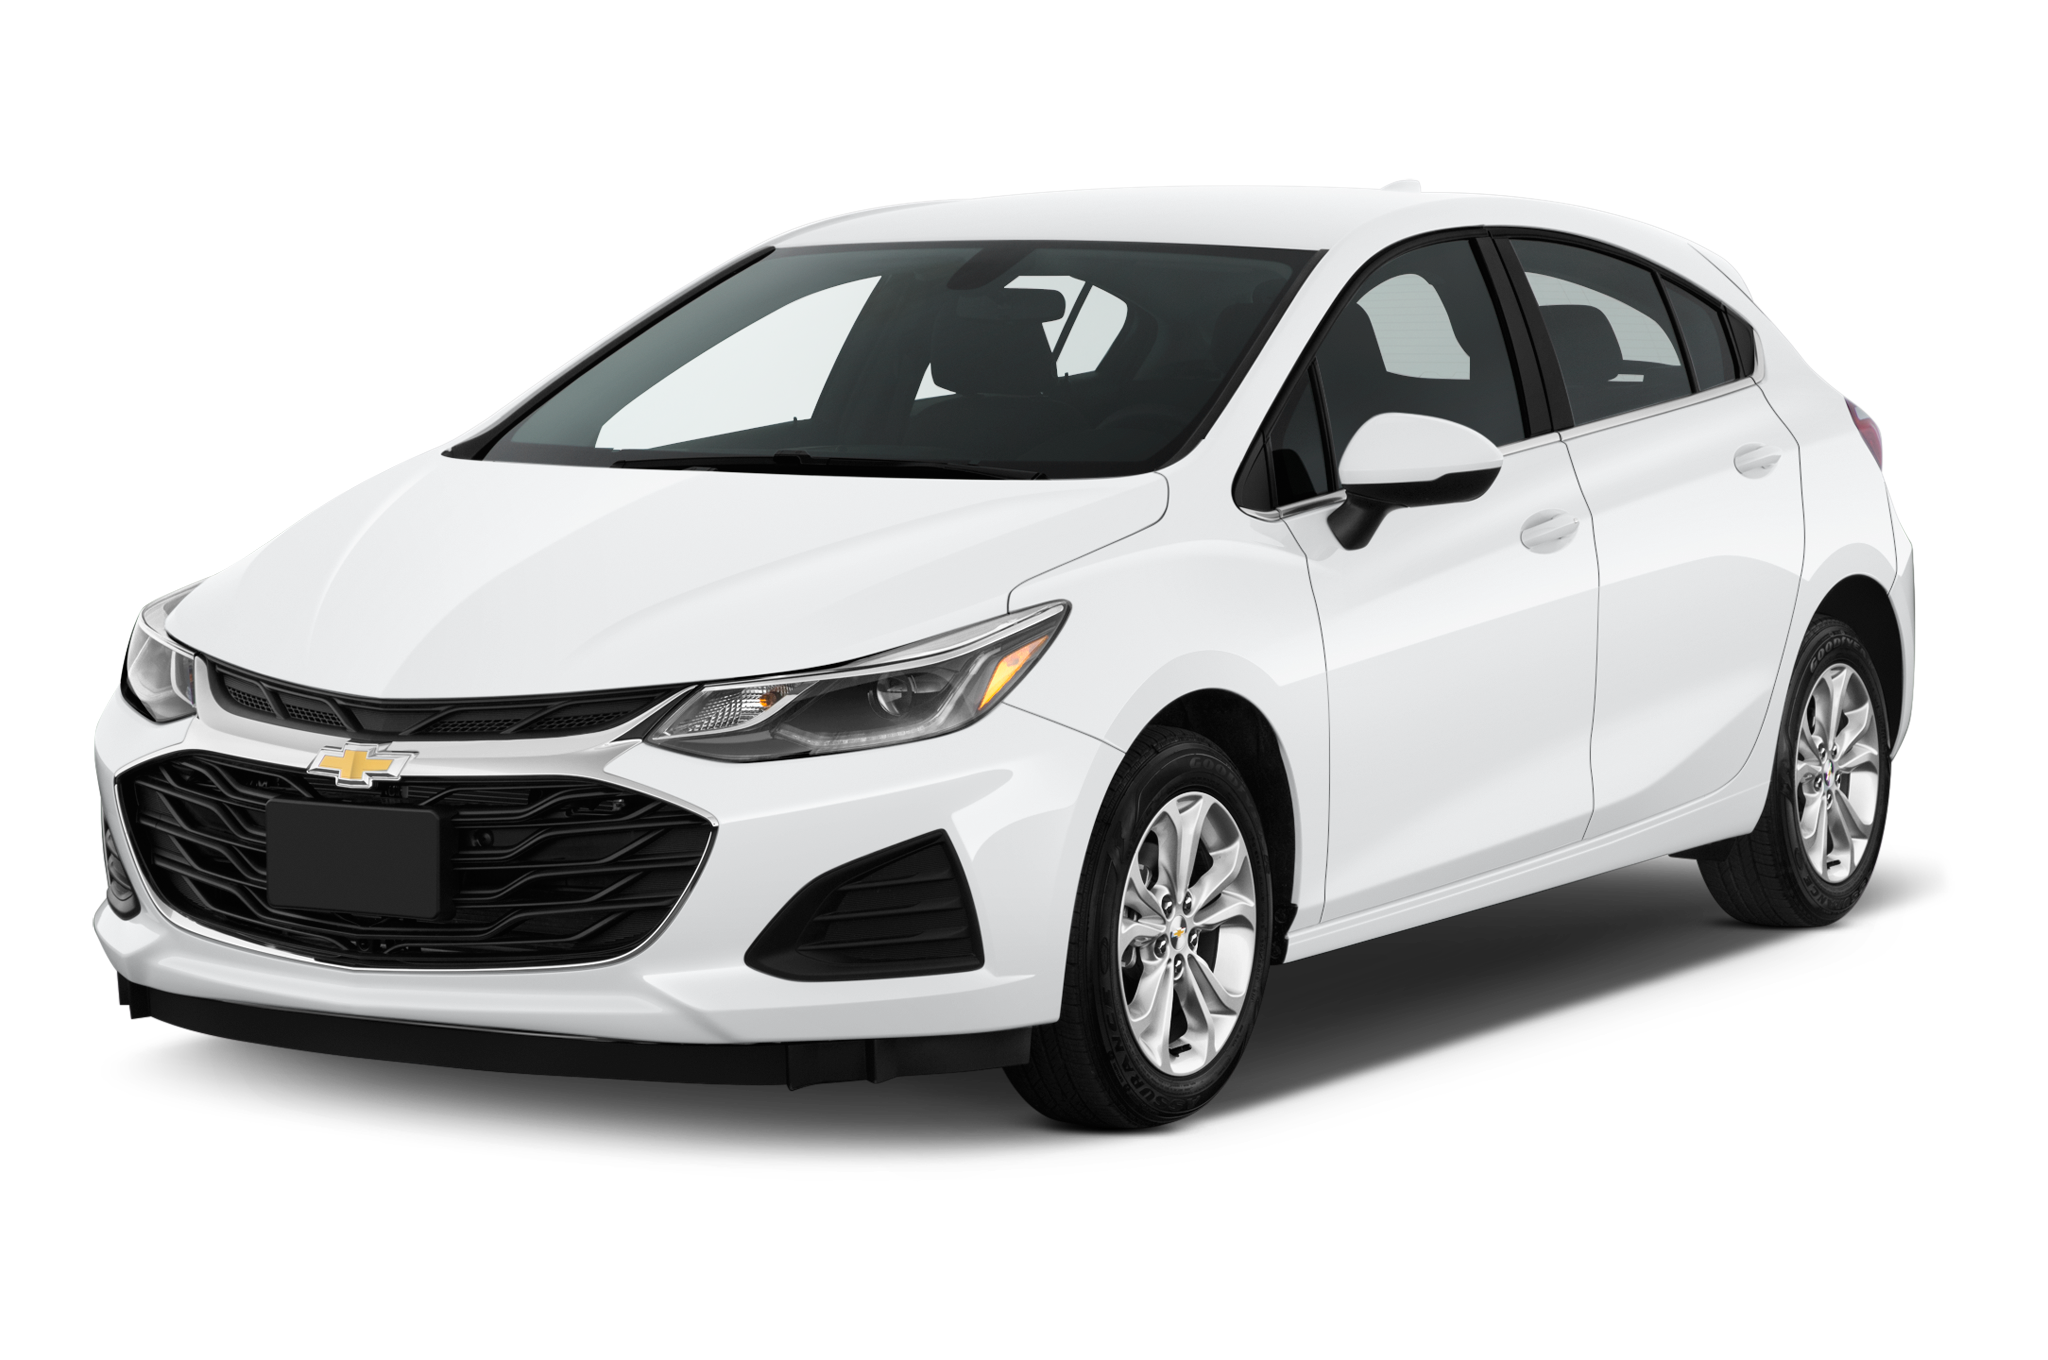 2019 Chevrolet Cruze LT Hatchback Auto Overview - MSN Autos